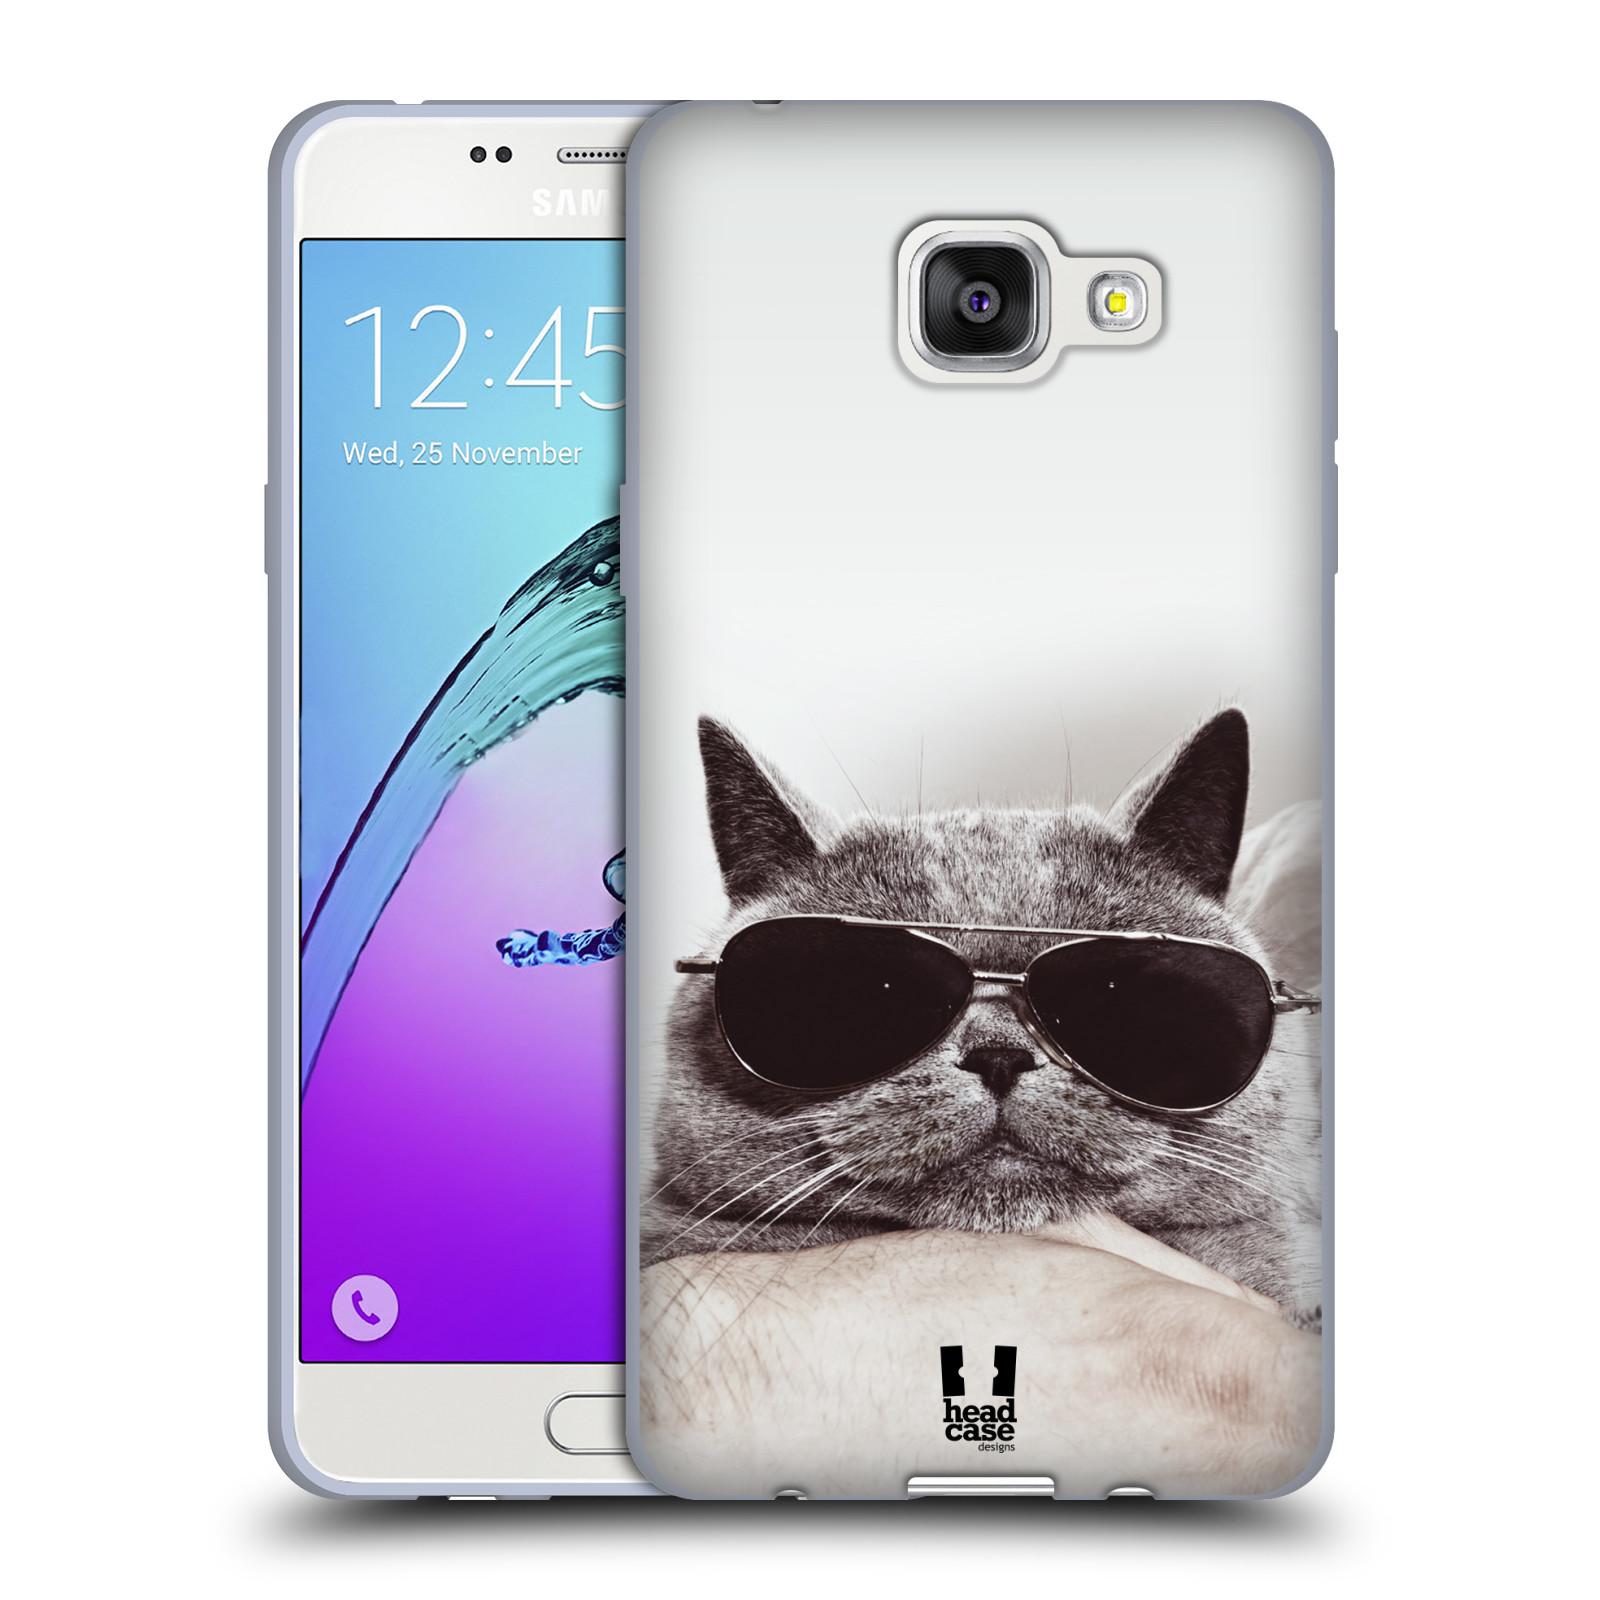 Silikonové pouzdro na mobil Samsung Galaxy A5 (2016) HEAD CASE KOTĚ S BRÝLEMI (Silikonový kryt či obal na mobilní telefon Samsung Galaxy A5 (2016) SM-A510F)